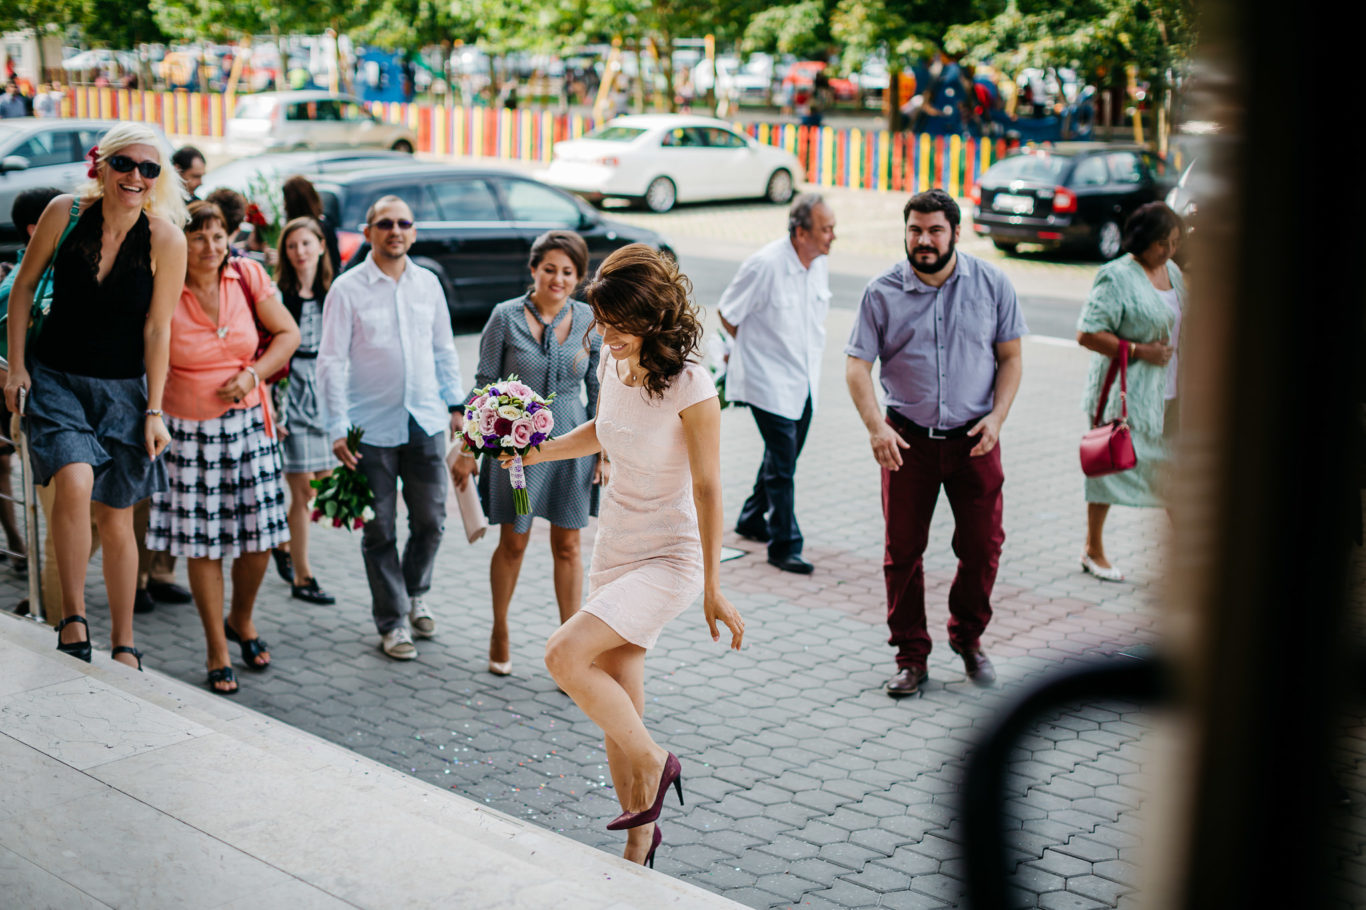 0035-fotografie-nunta-bucuresti-dana-radu-fotograf-ciprian-dumitrescu-cd2_6117